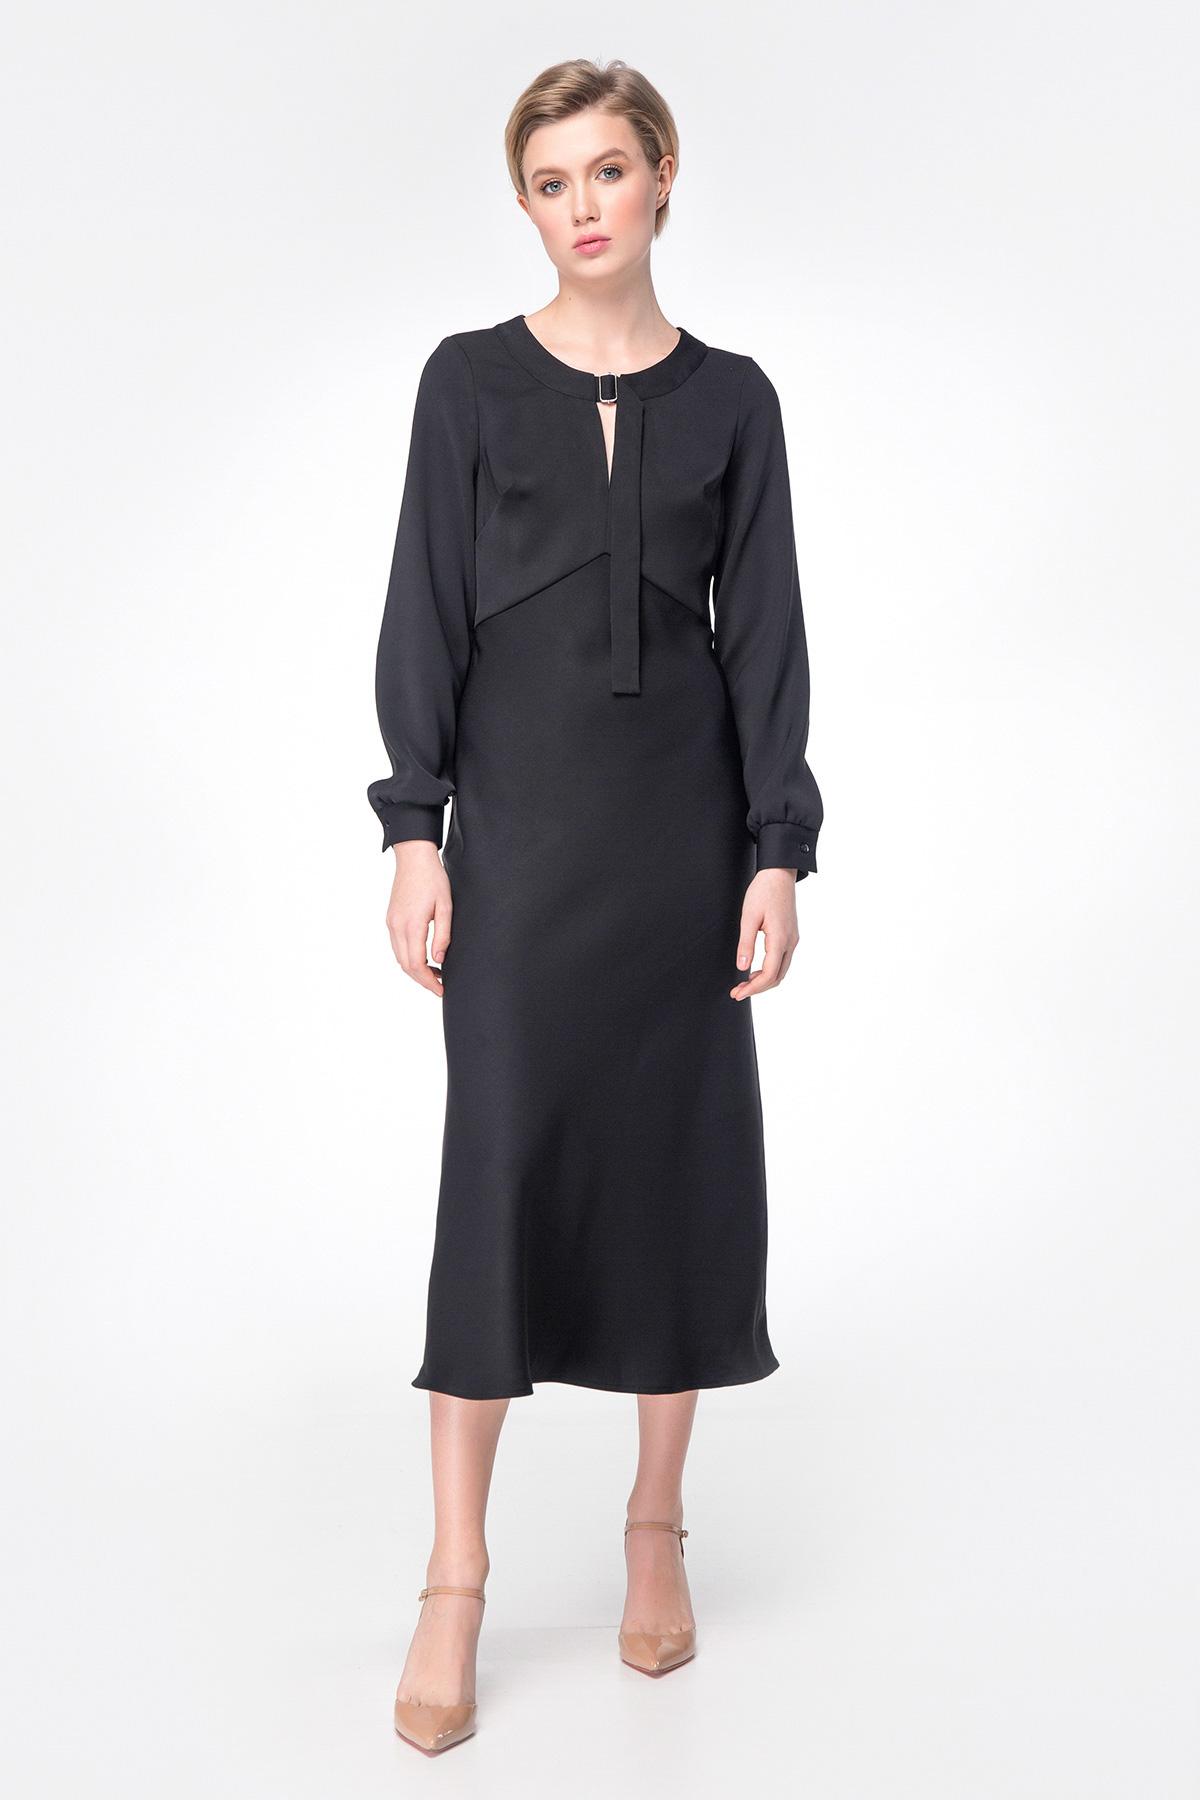 Платье женские MustHave модель 6458 , 2017